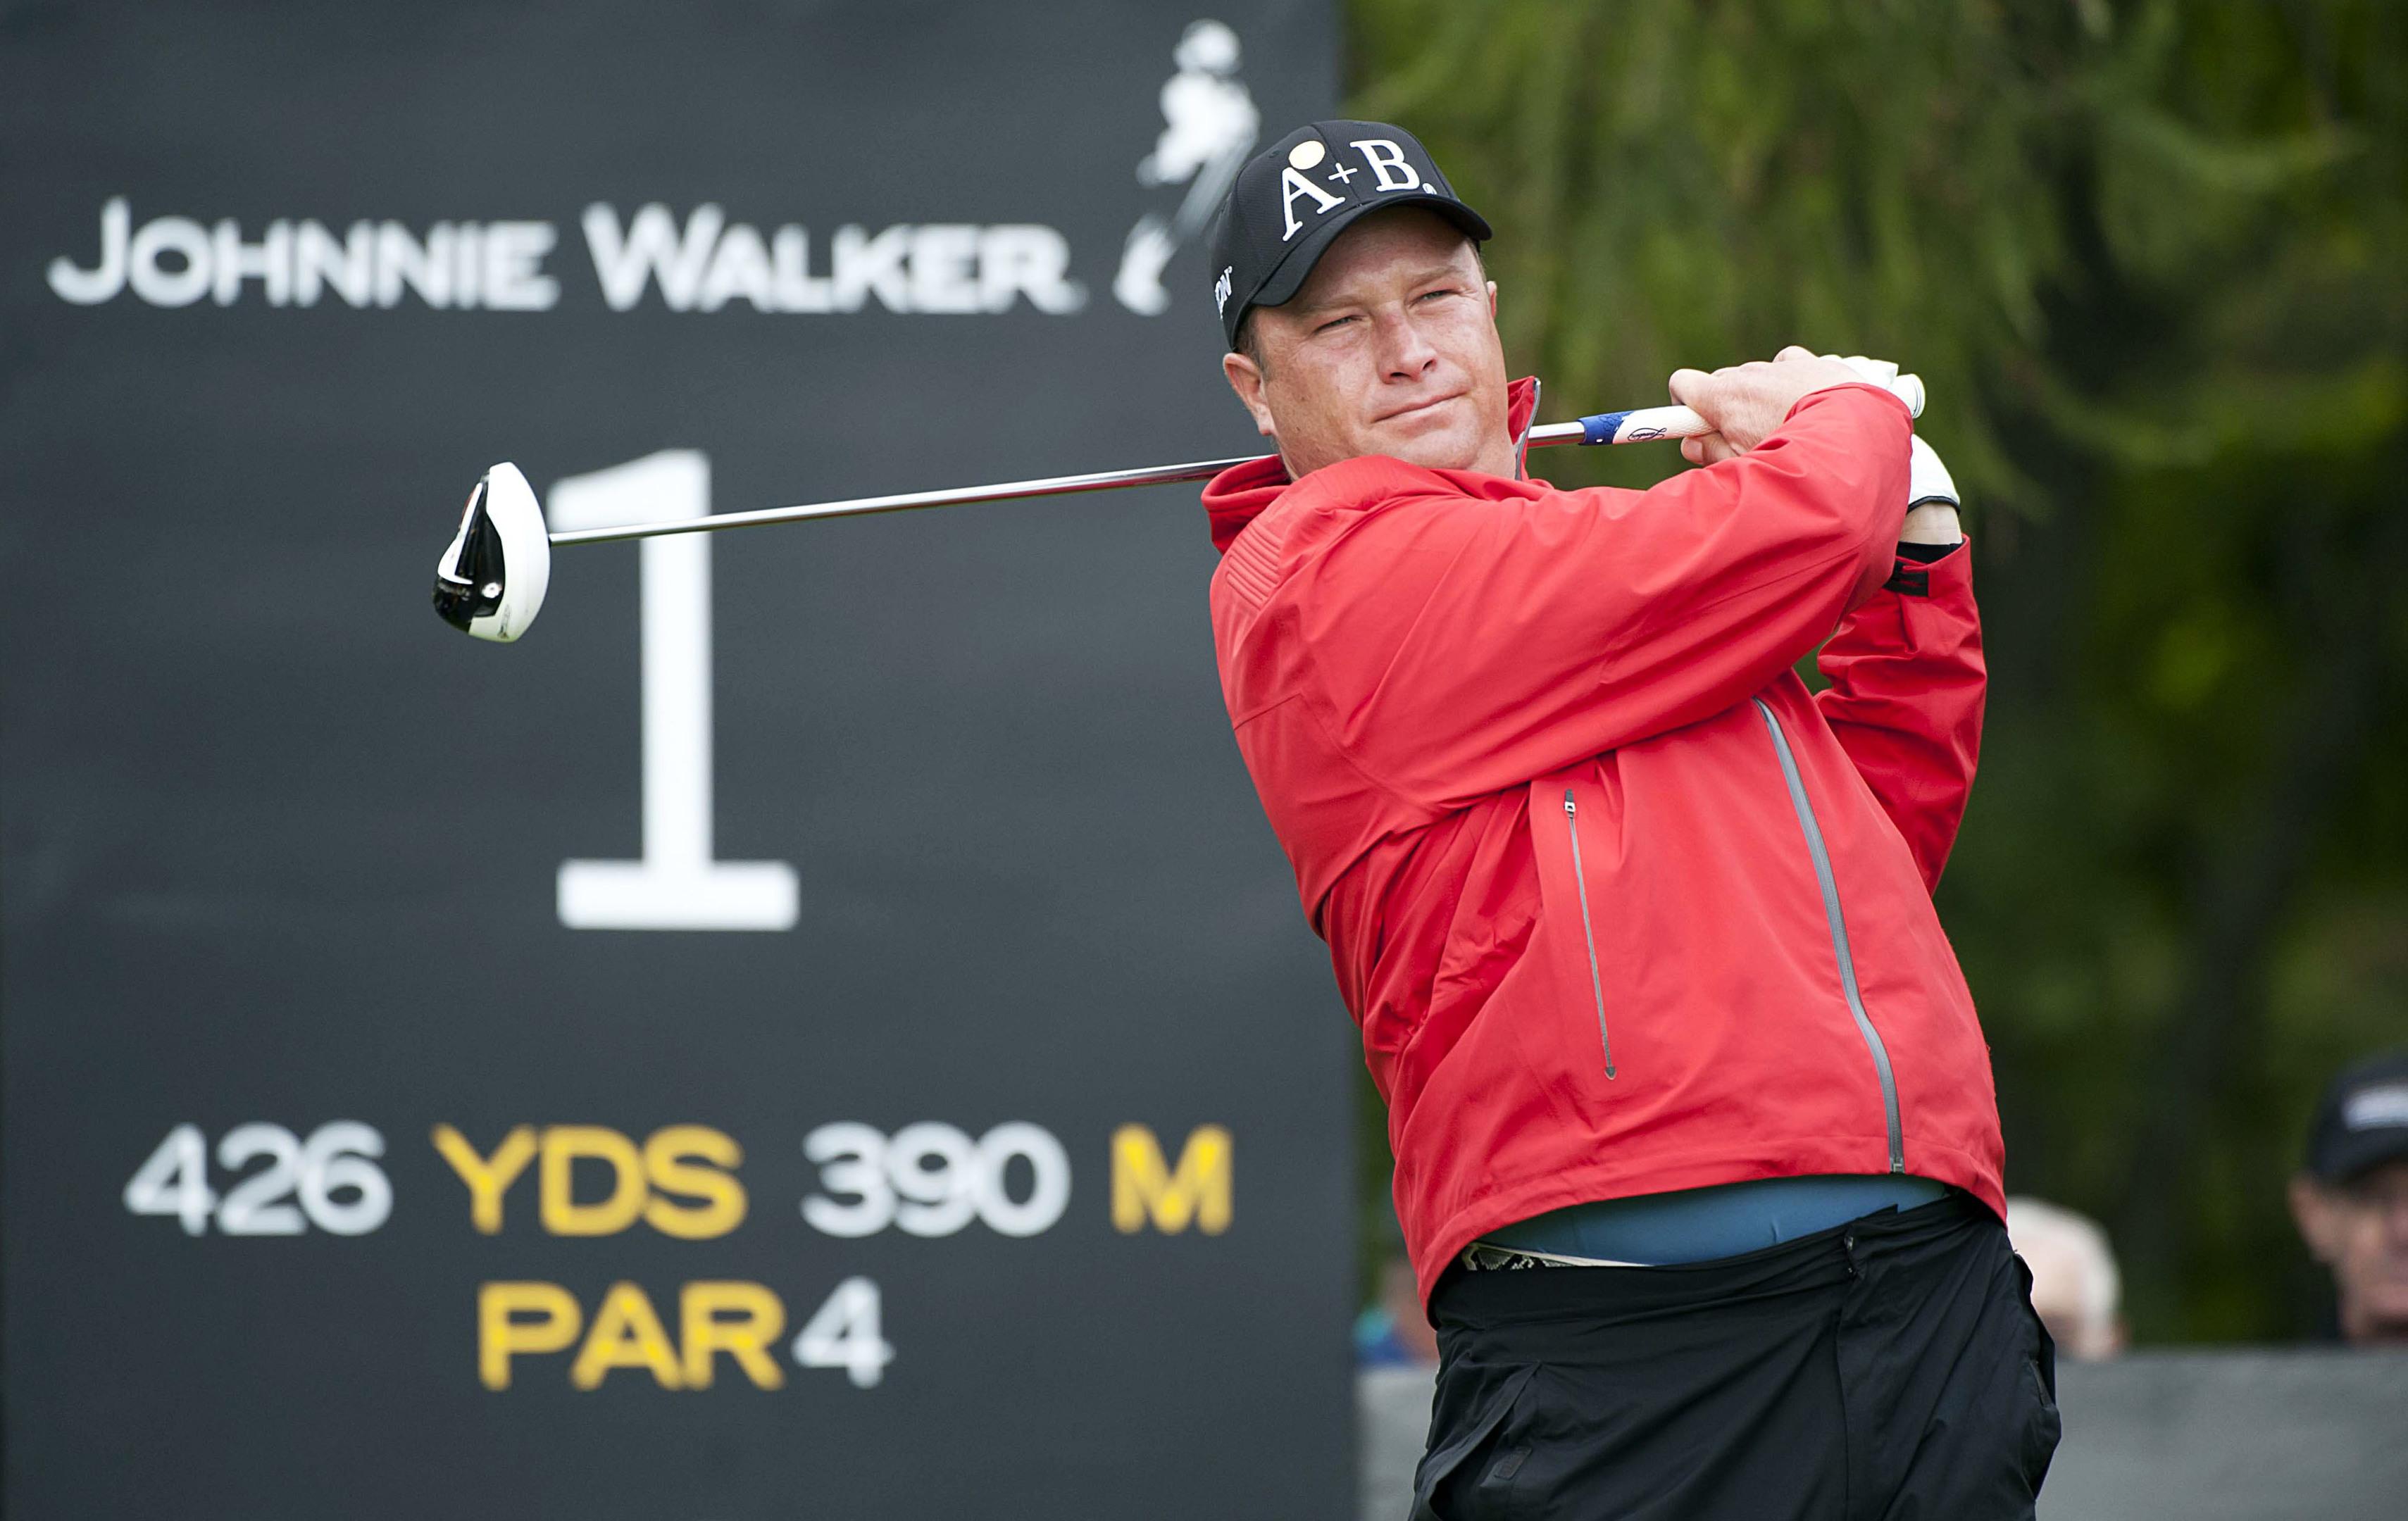 Greig Hutcheon won his third Scottish PGA Championship at Gleneagles.